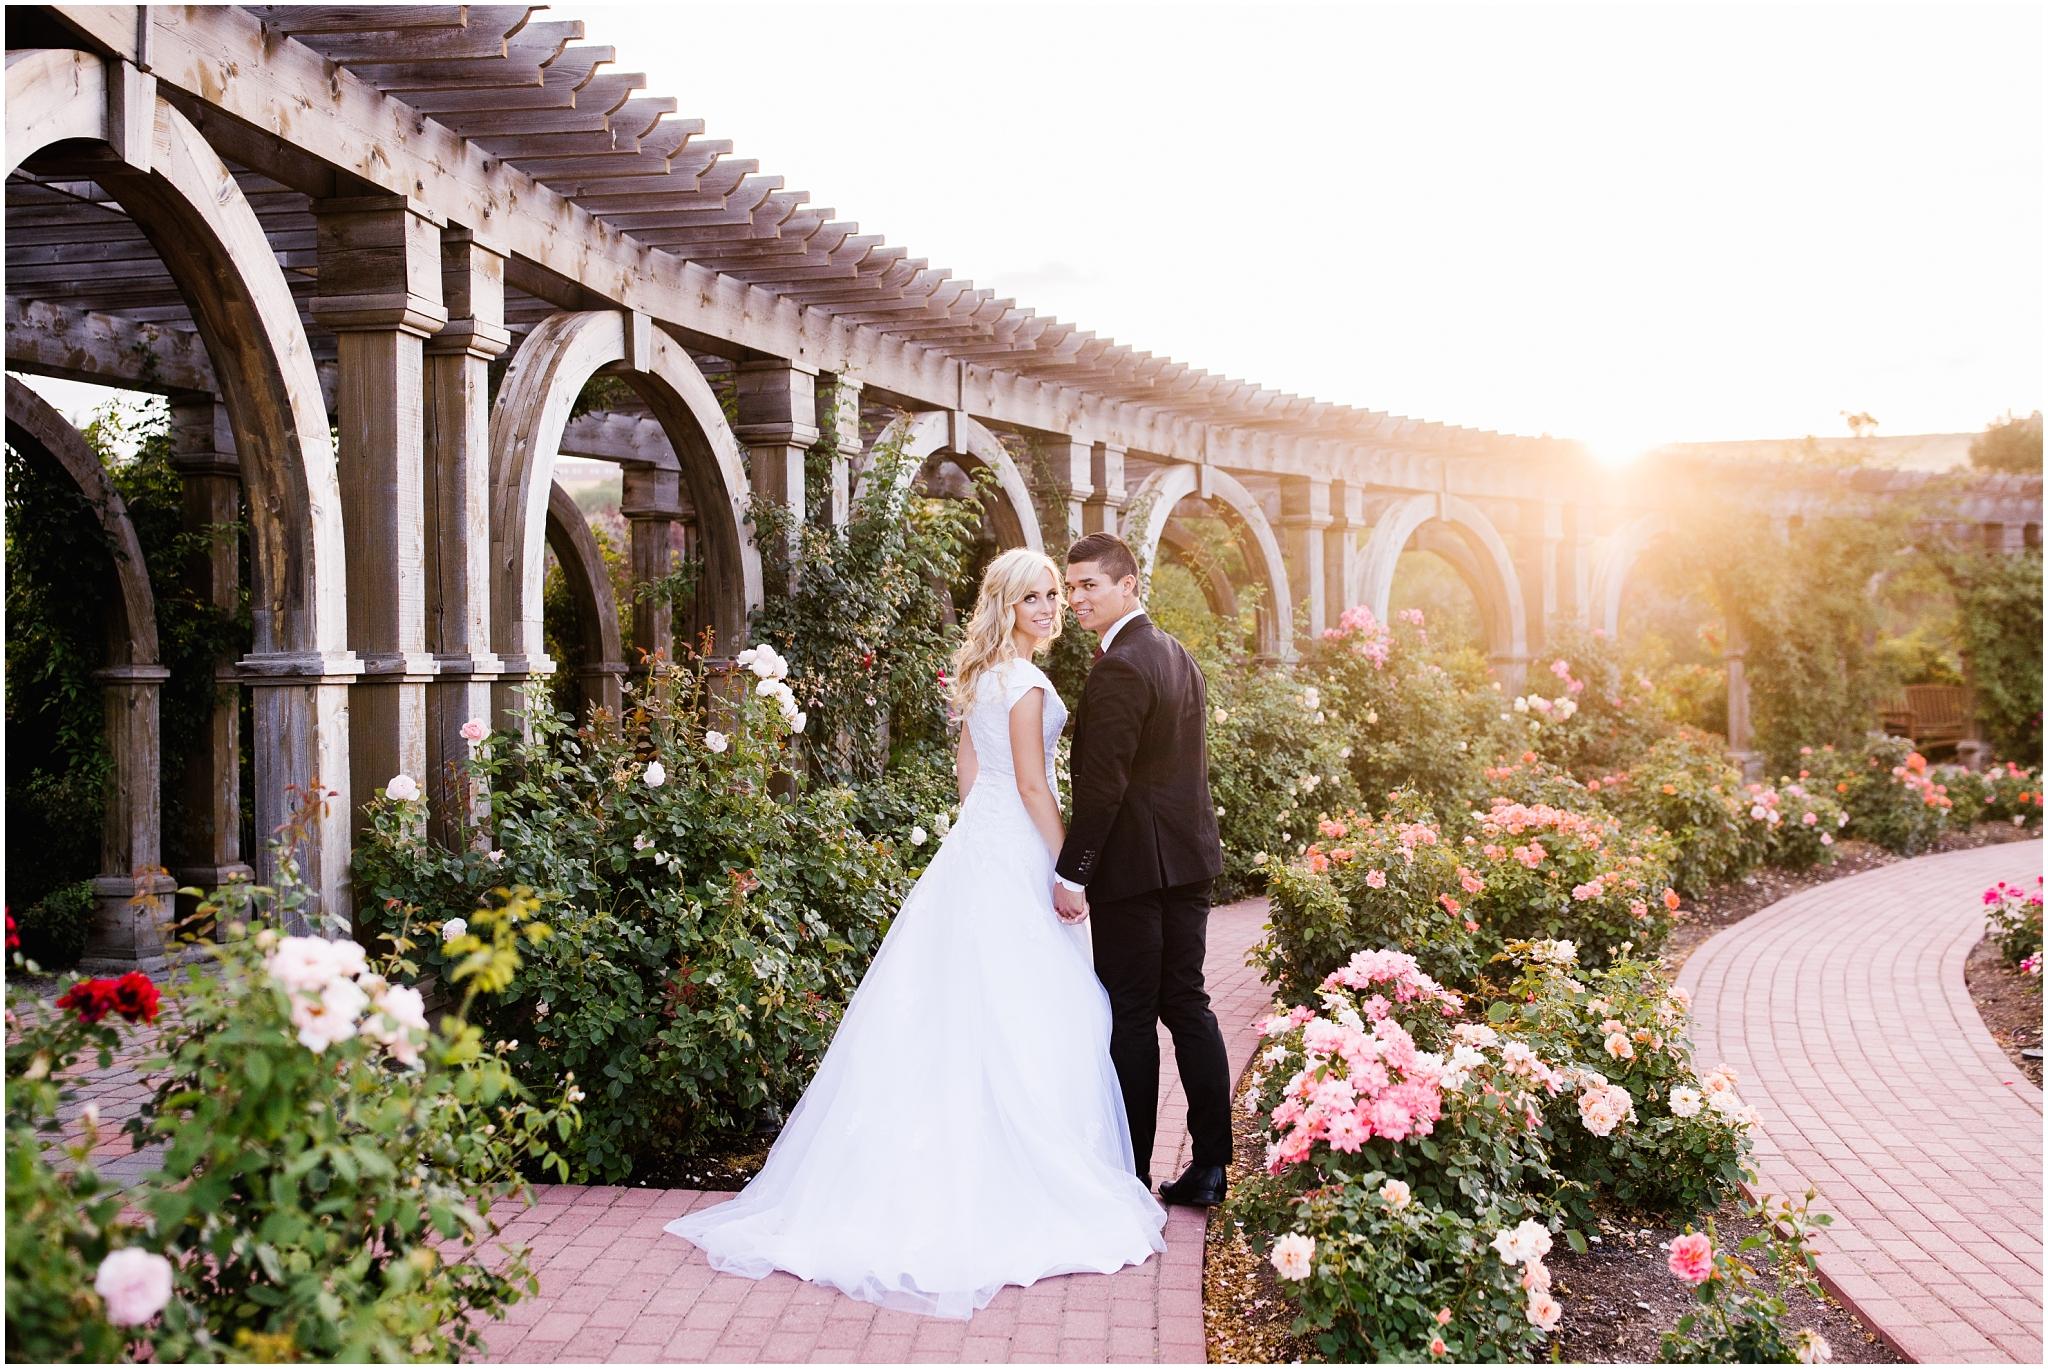 CHBridals-122_Lizzie-B-Imagery-Utah-Wedding-Photographer-Central-Utah-Park-City-Salt-Lake-City-Thanksgiving-Point-Bridals-Ashton-Gardens.jpg